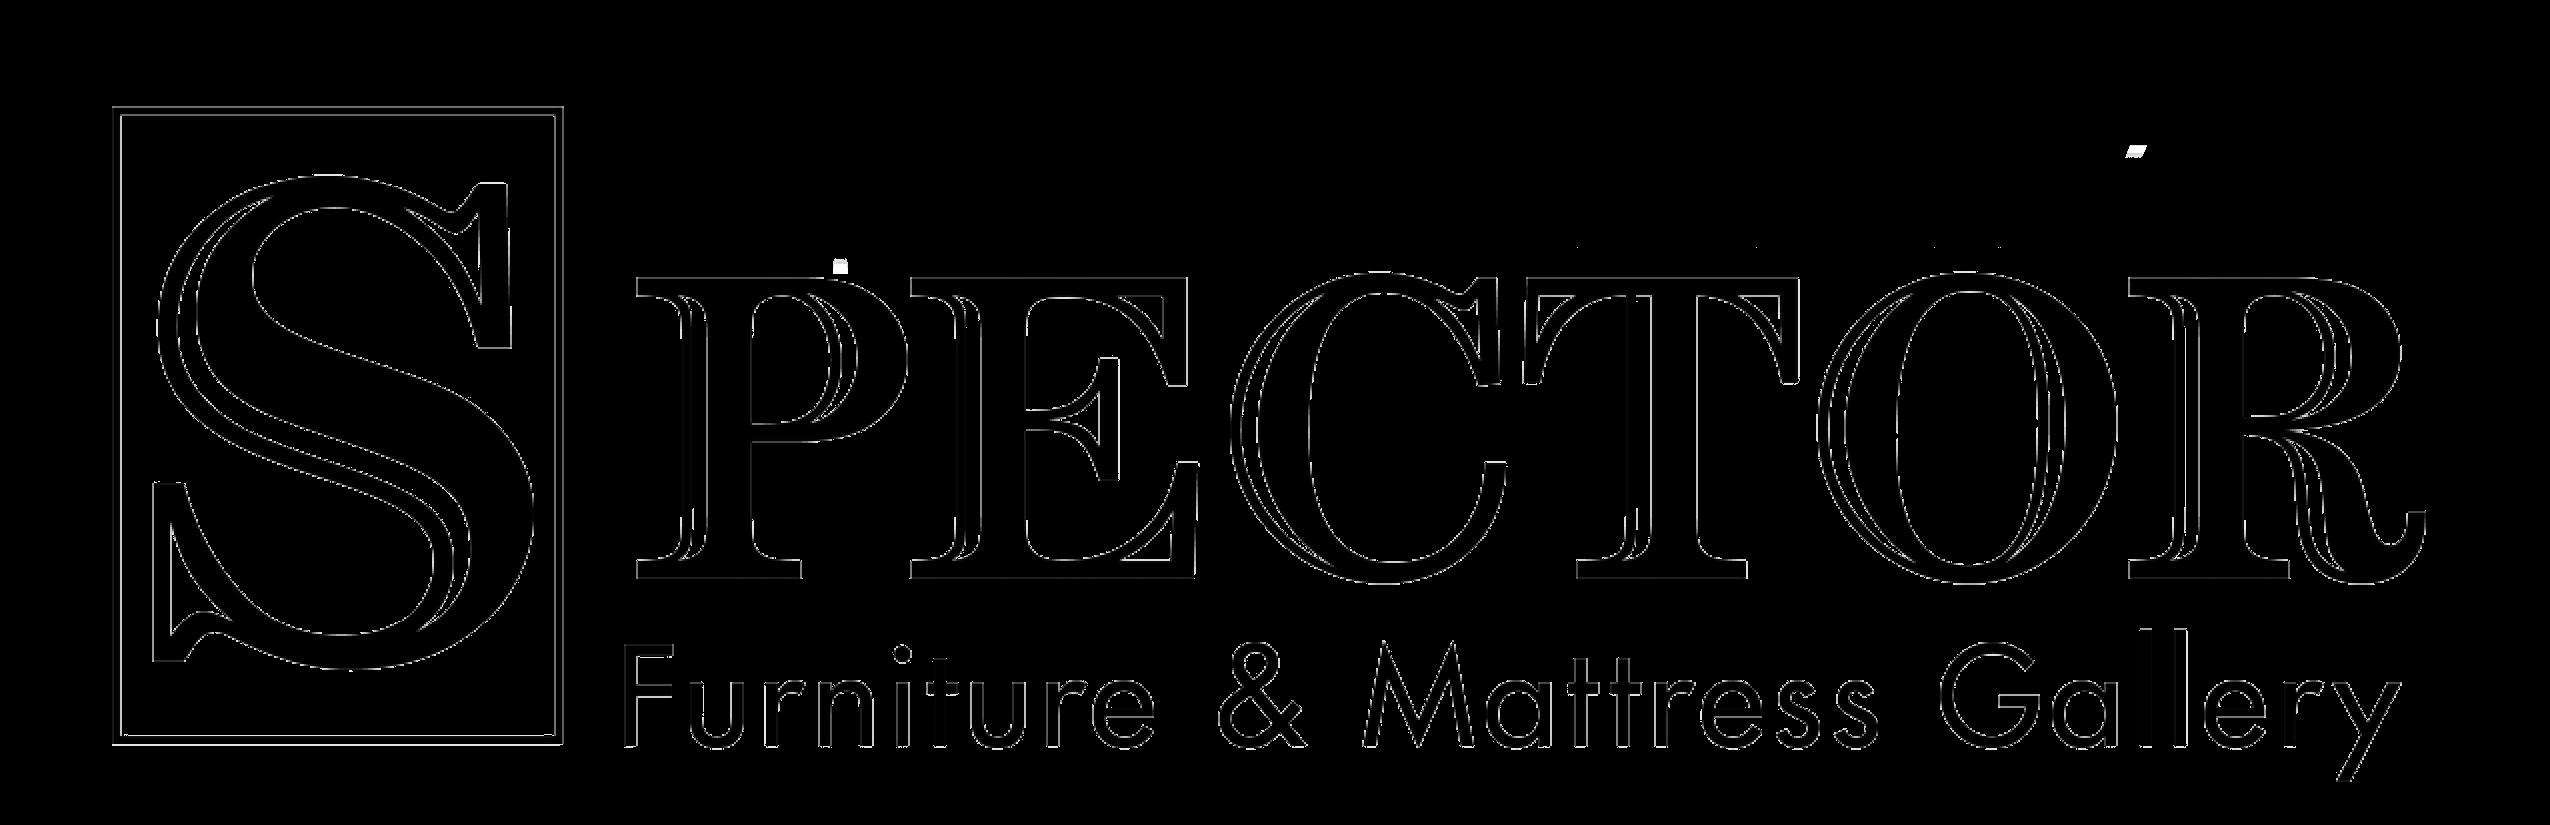 Spector Furniture U0026 Mattress Gallery Logo